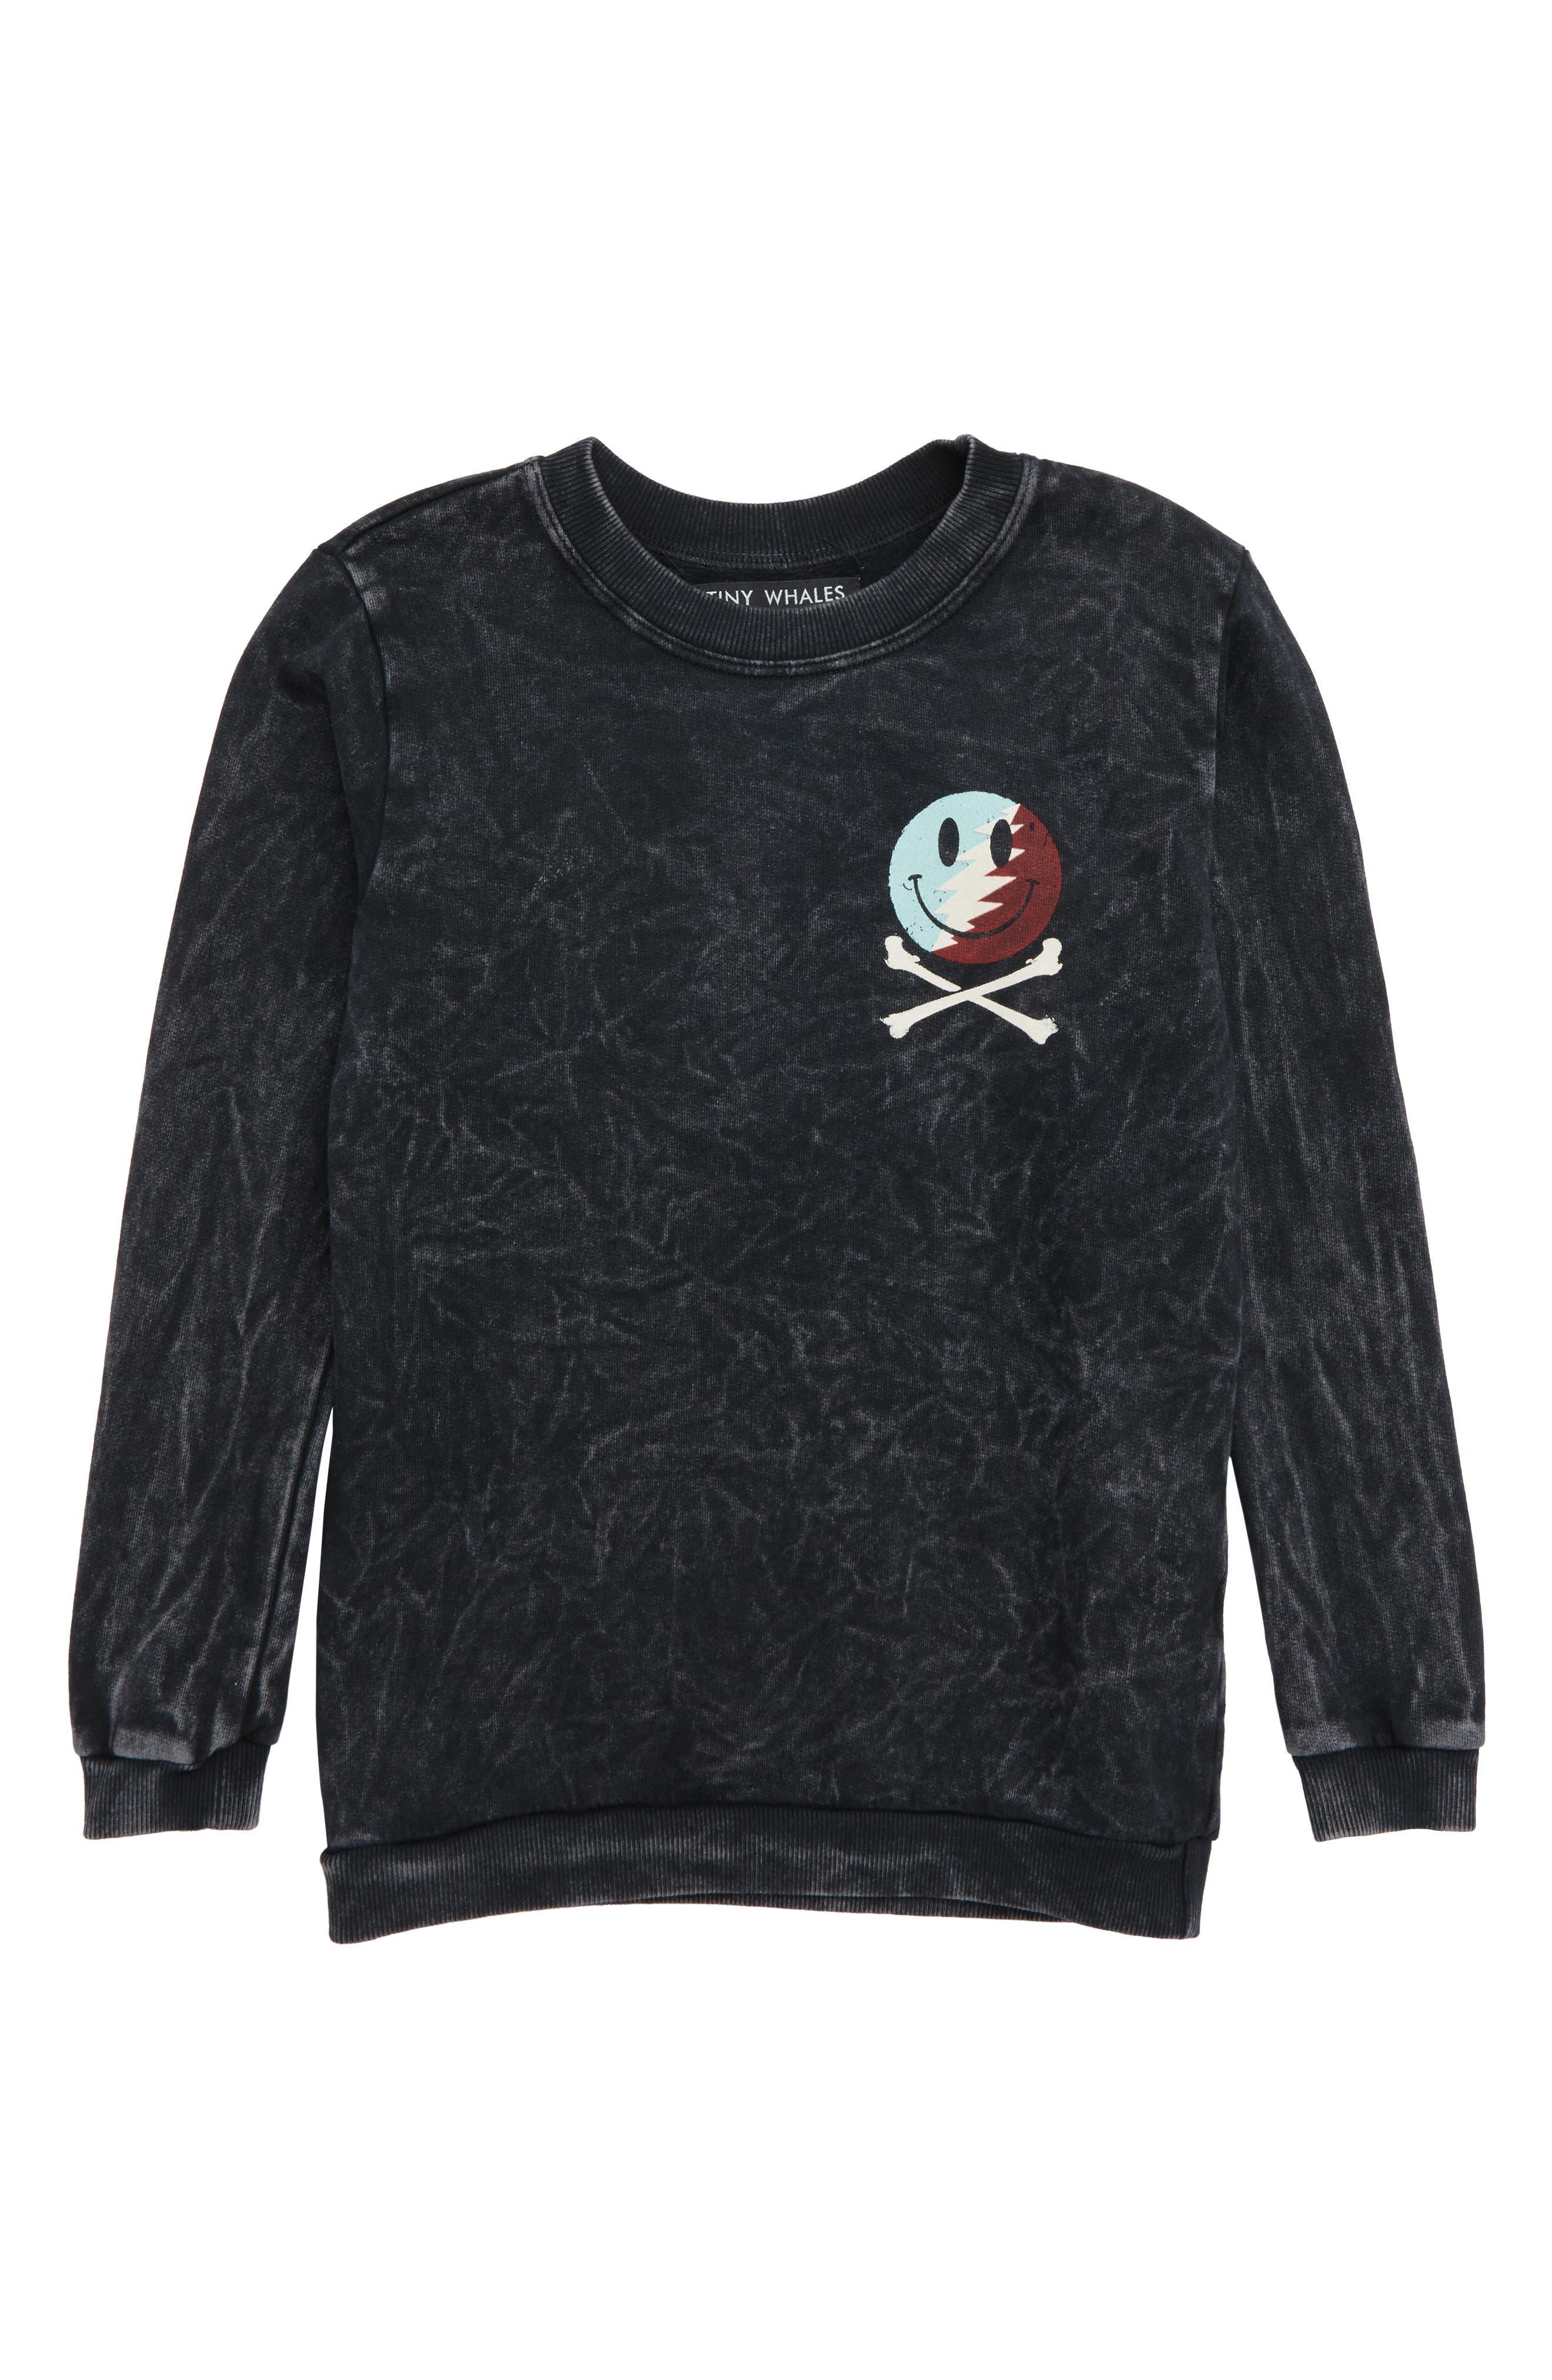 Rad to the Bone Sweatshirt,                             Main thumbnail 1, color,                             MINERAL BLACK